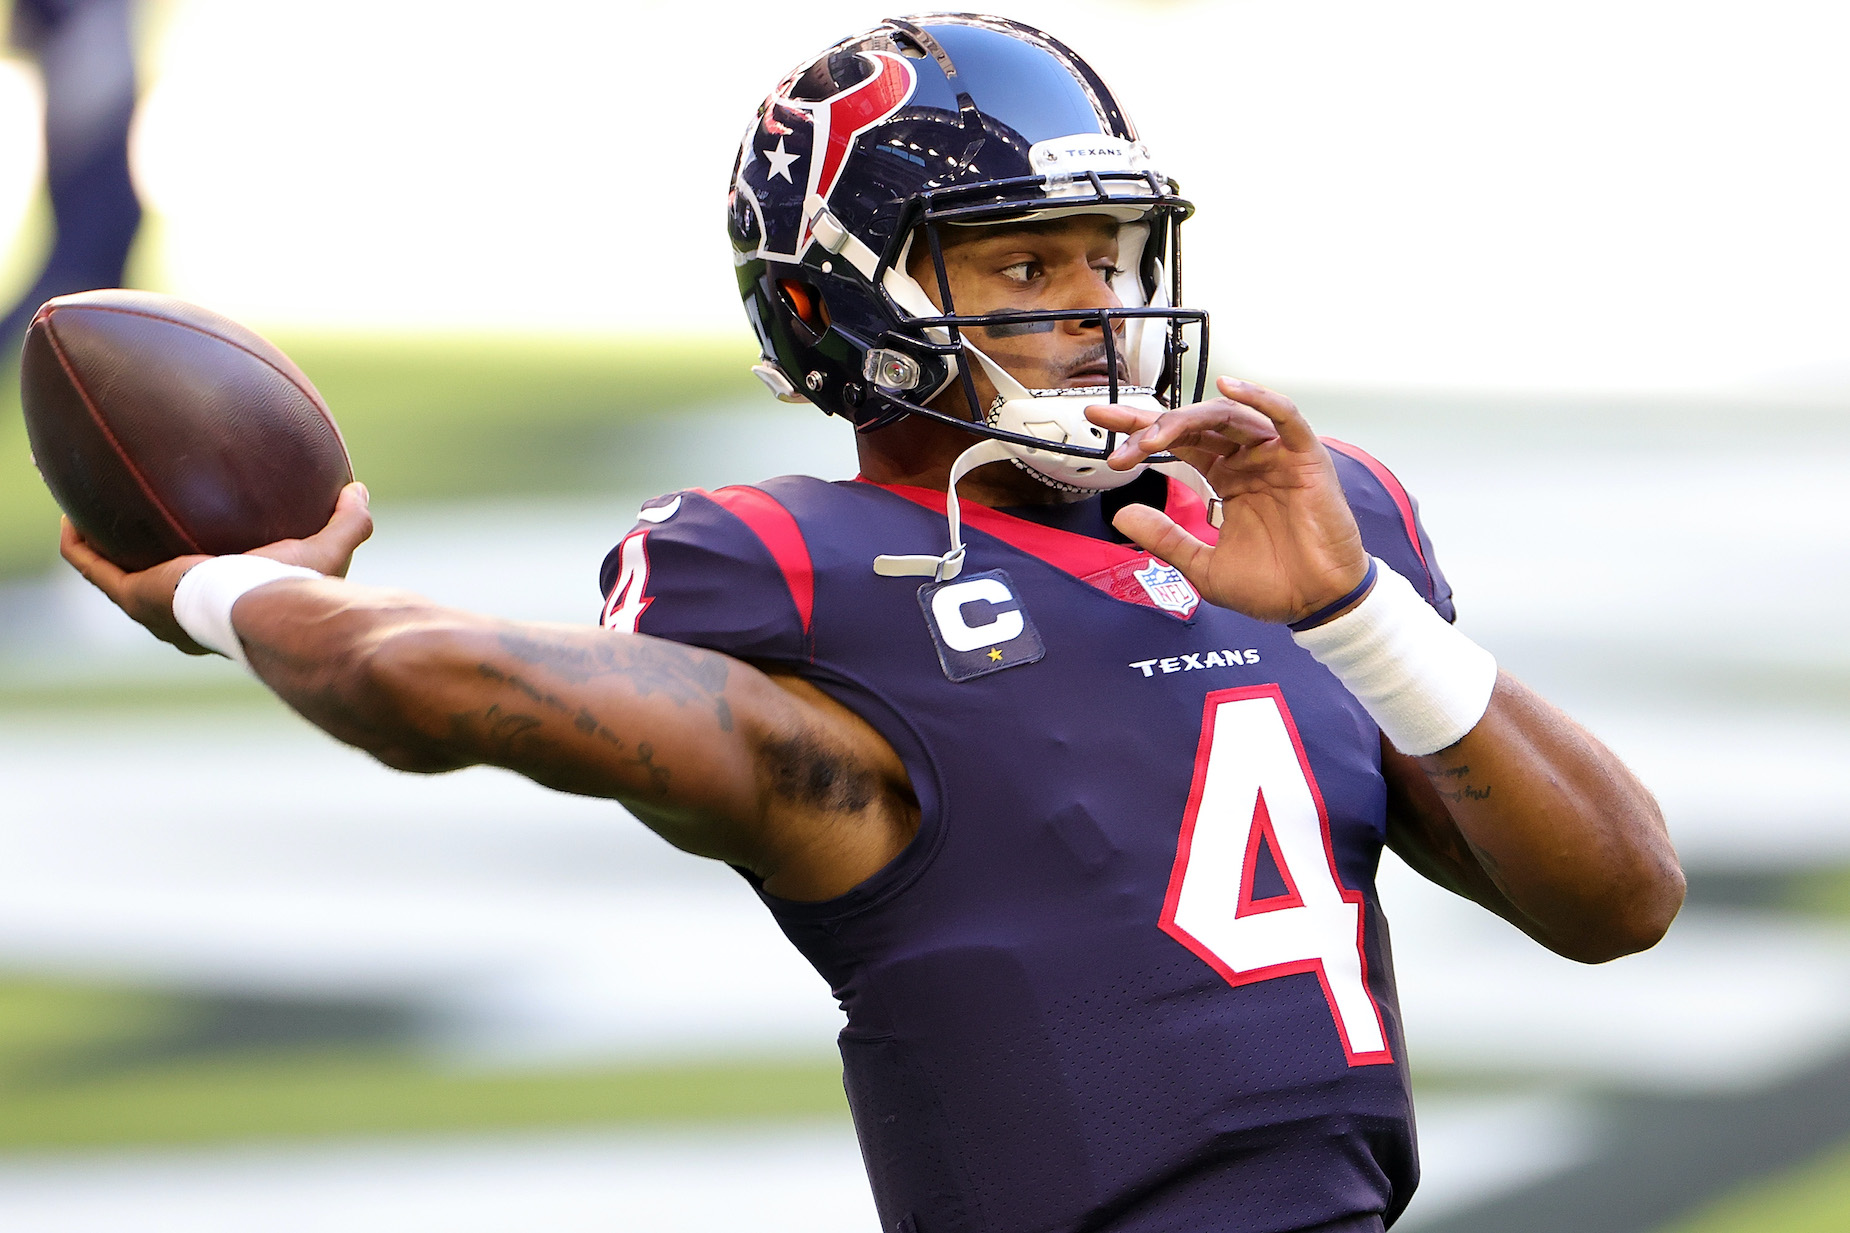 Houston Texans quarterback Deshaun Watson in NFL action.